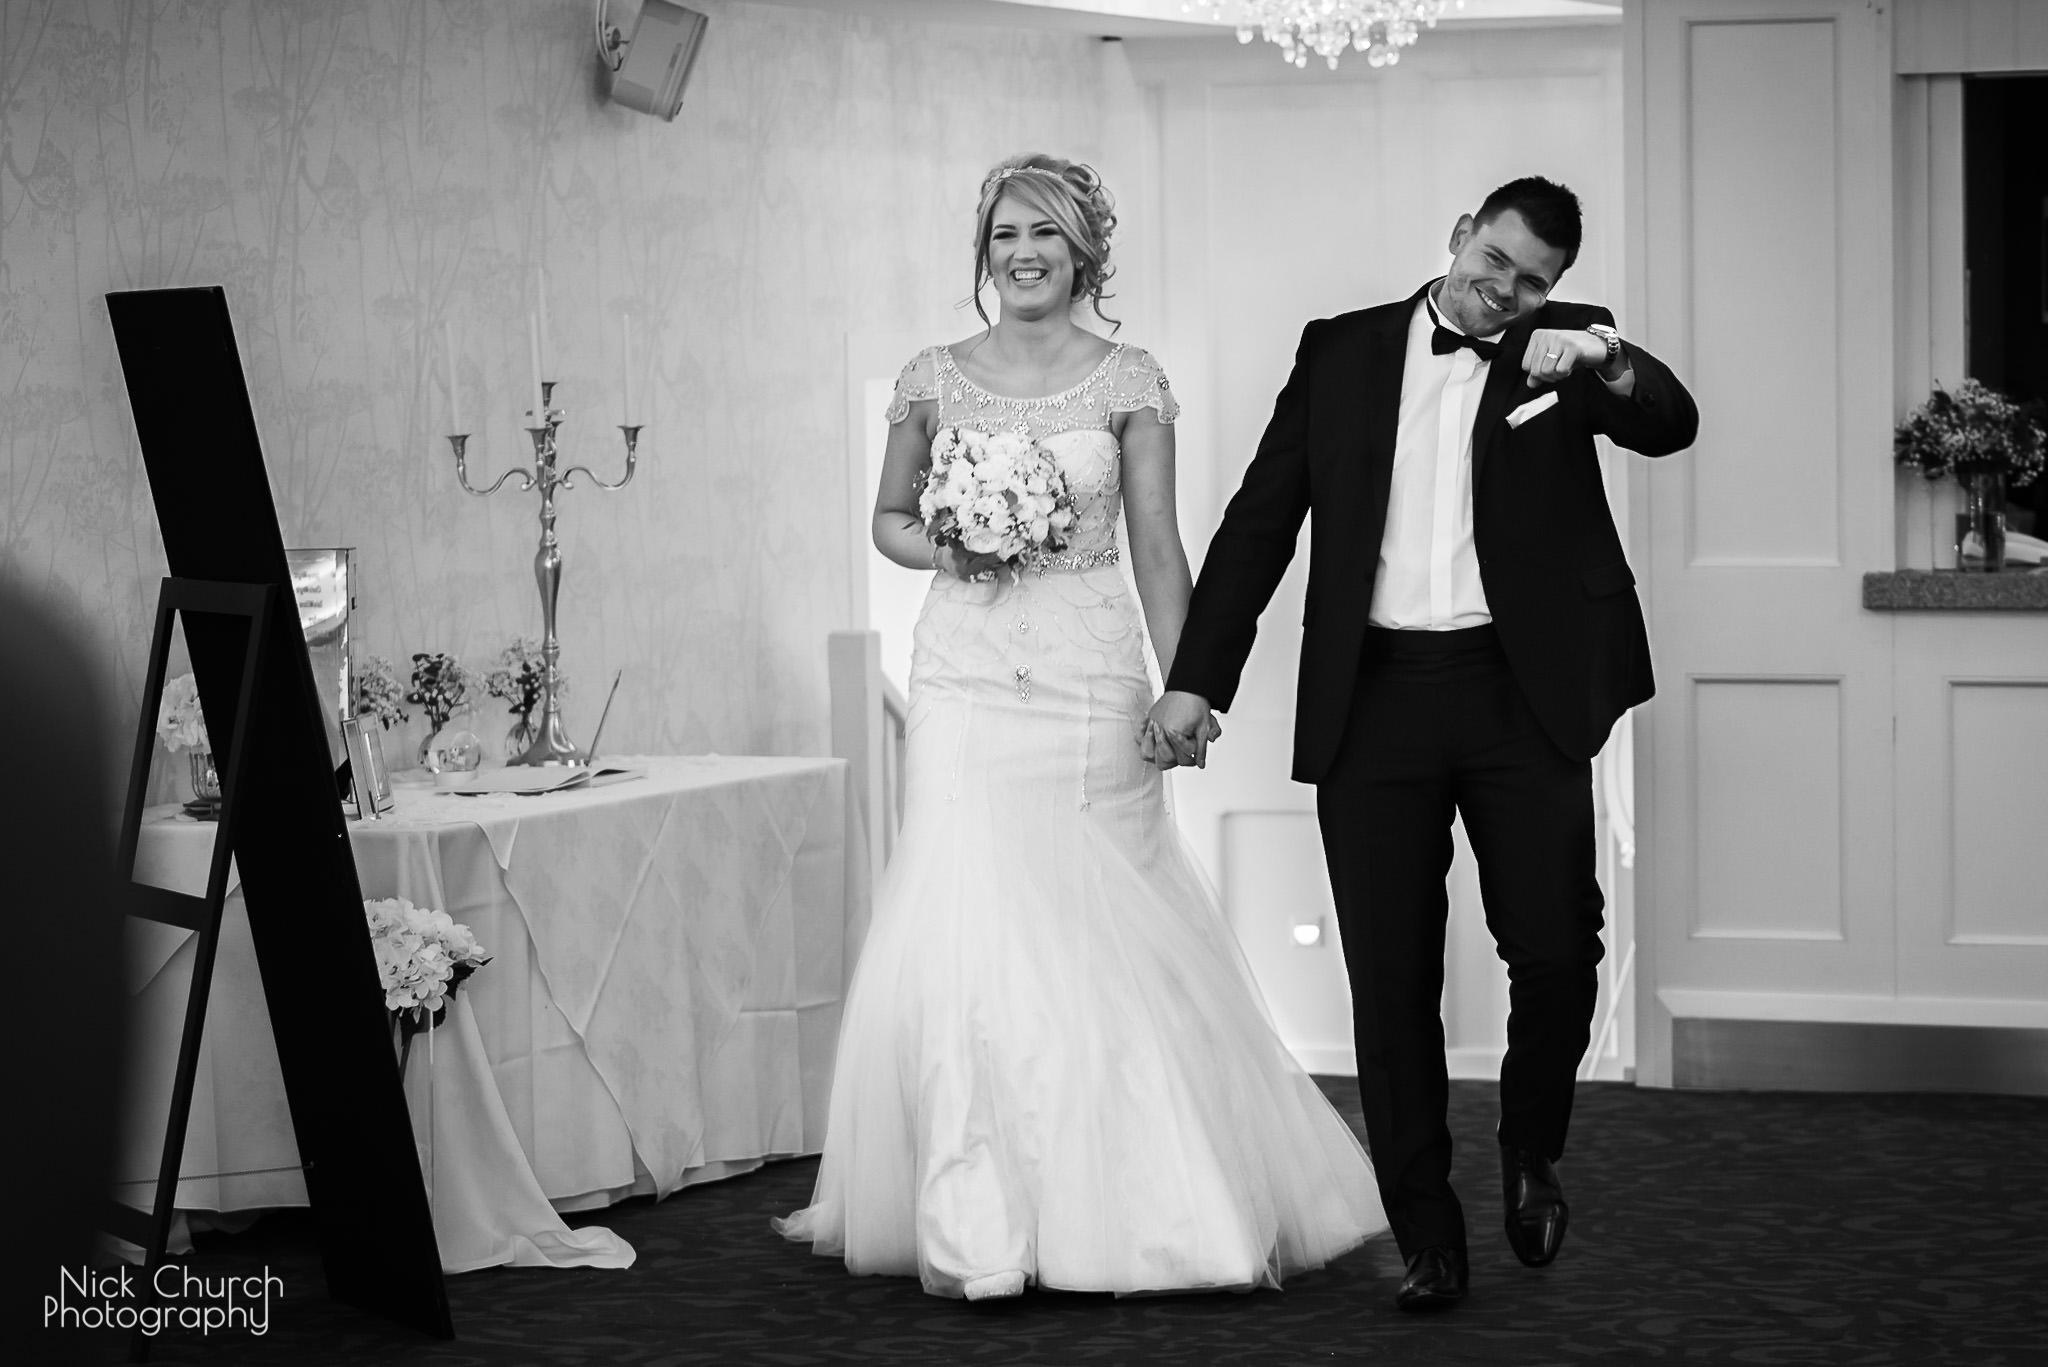 NC-20180317-stacy-and-mike-wedding-1624.jpg